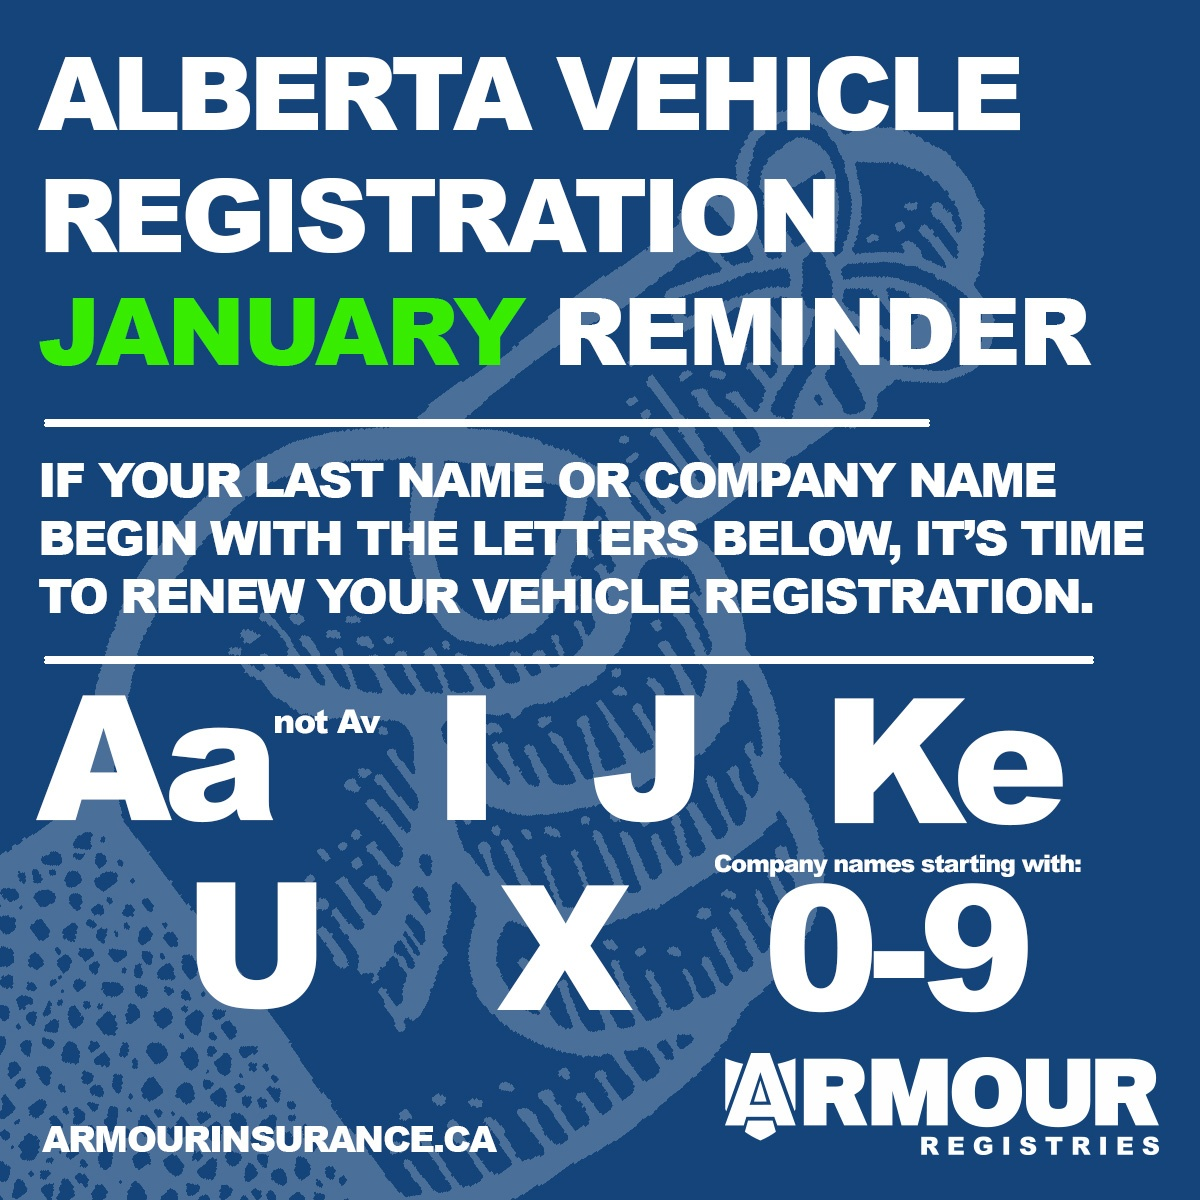 January Vehicle Registration Renewals